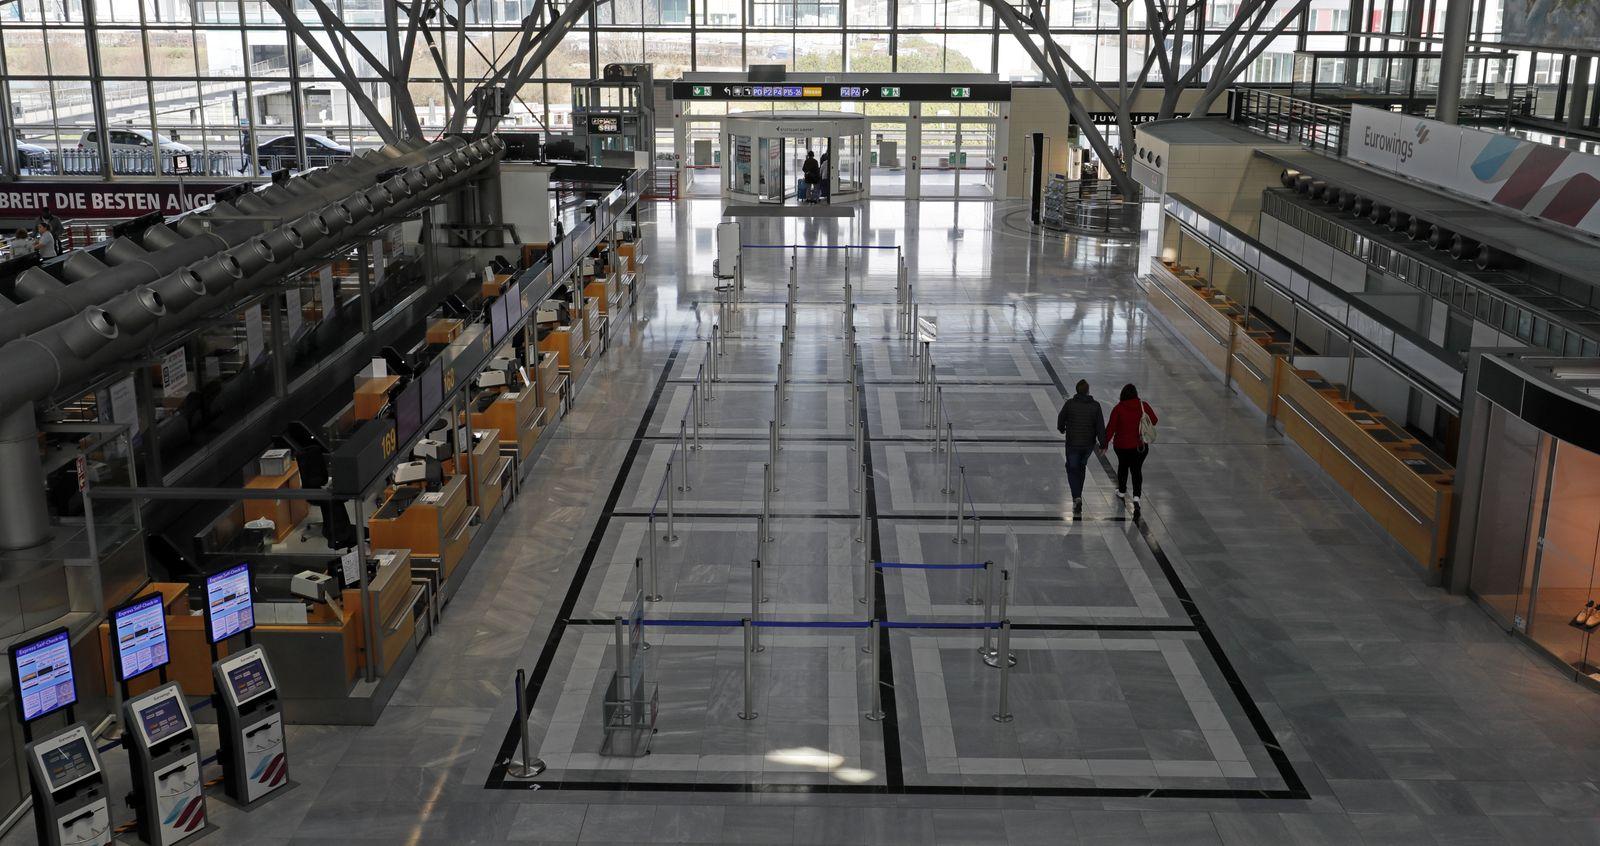 Stuttgart Internal Airport due the Coronovirus pandemic, Germany - 14 Mar 2020